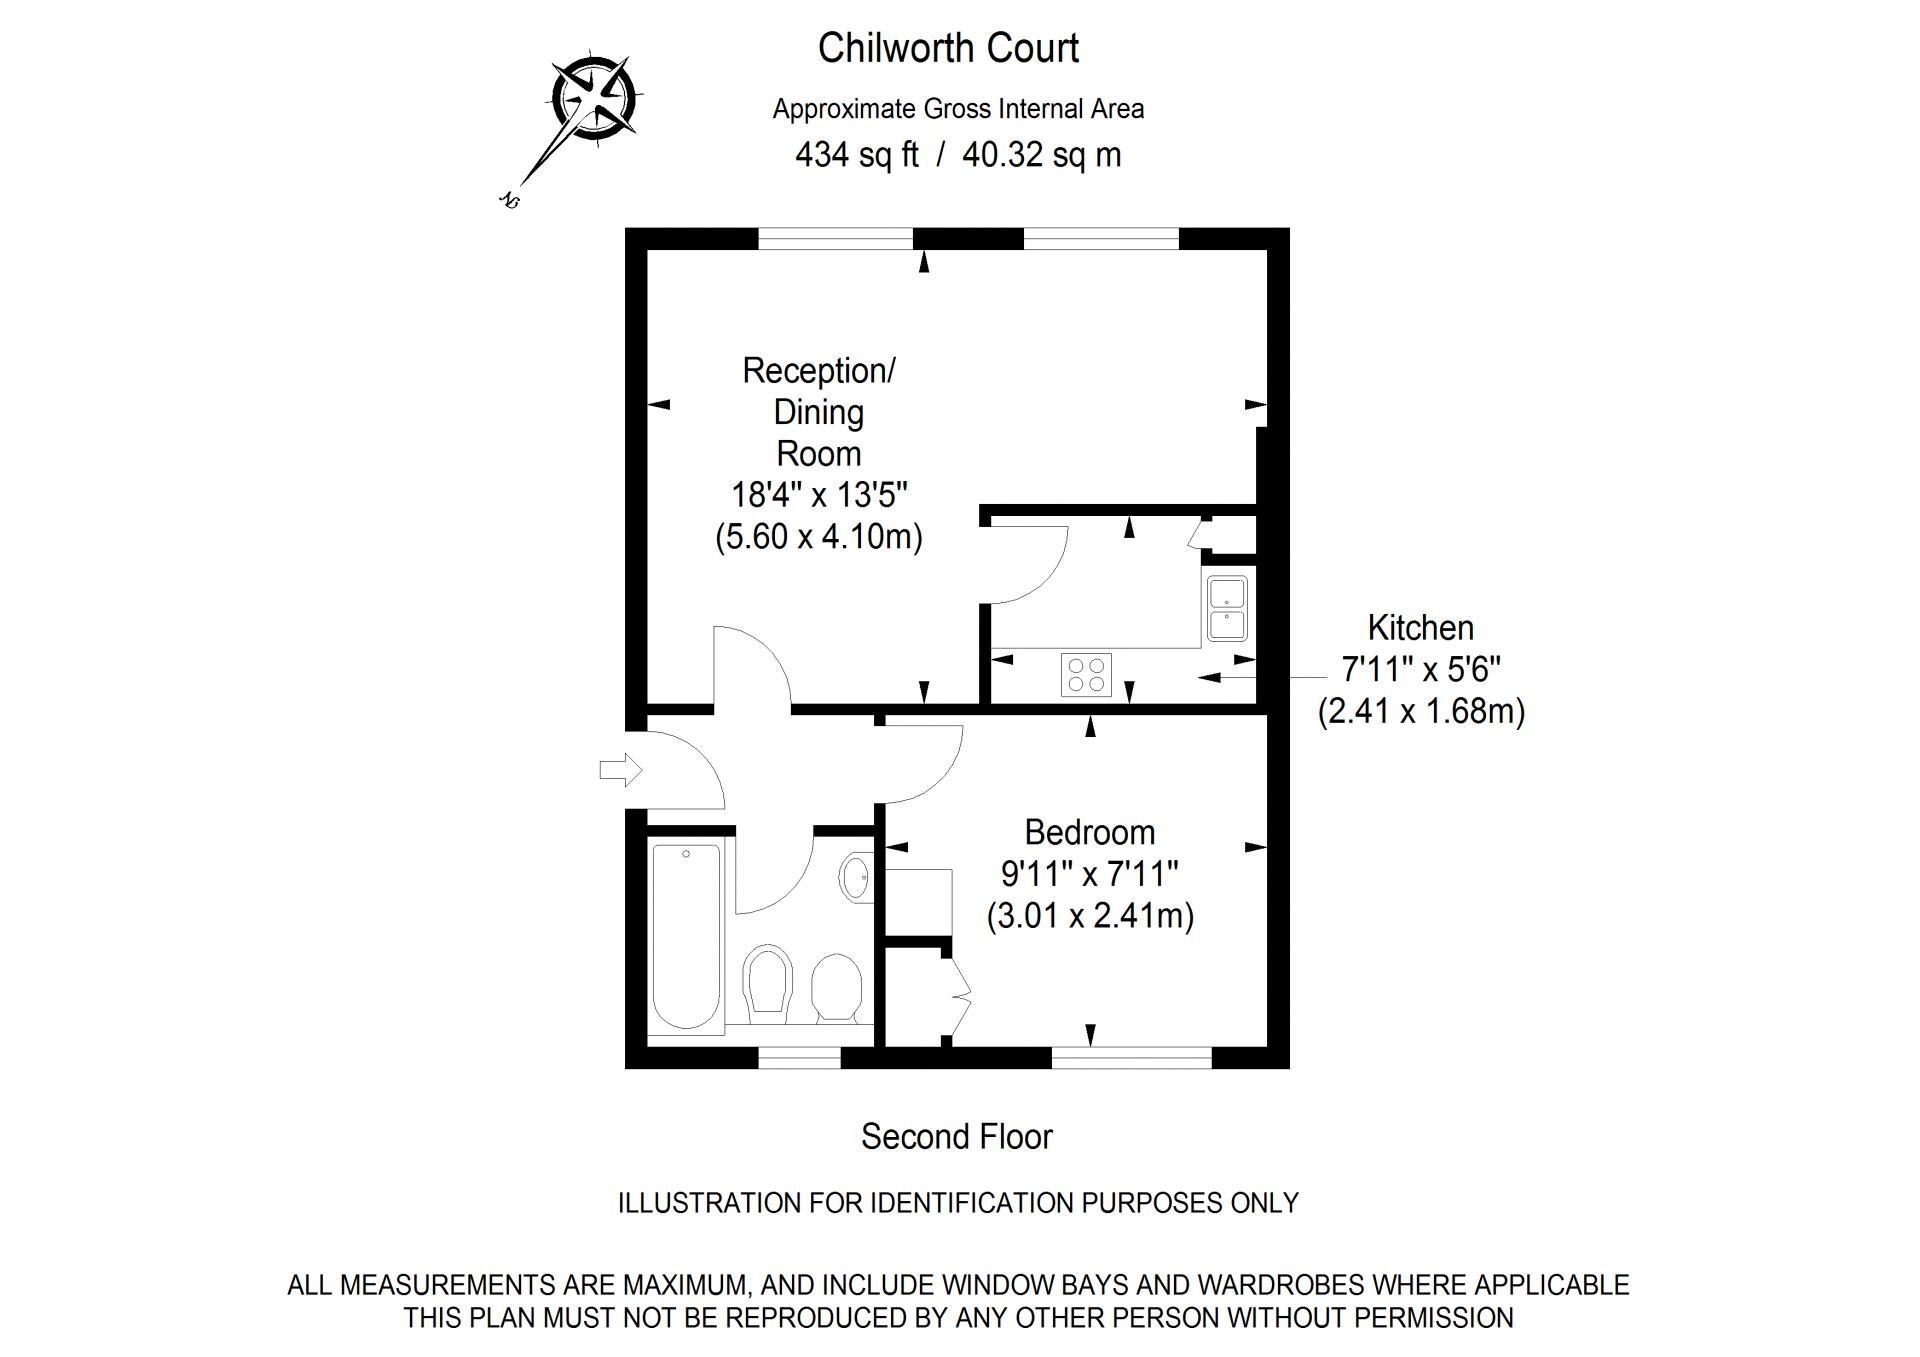 1 bed floor plan of Chilworth Court Serviced Apartments, Paddington, London